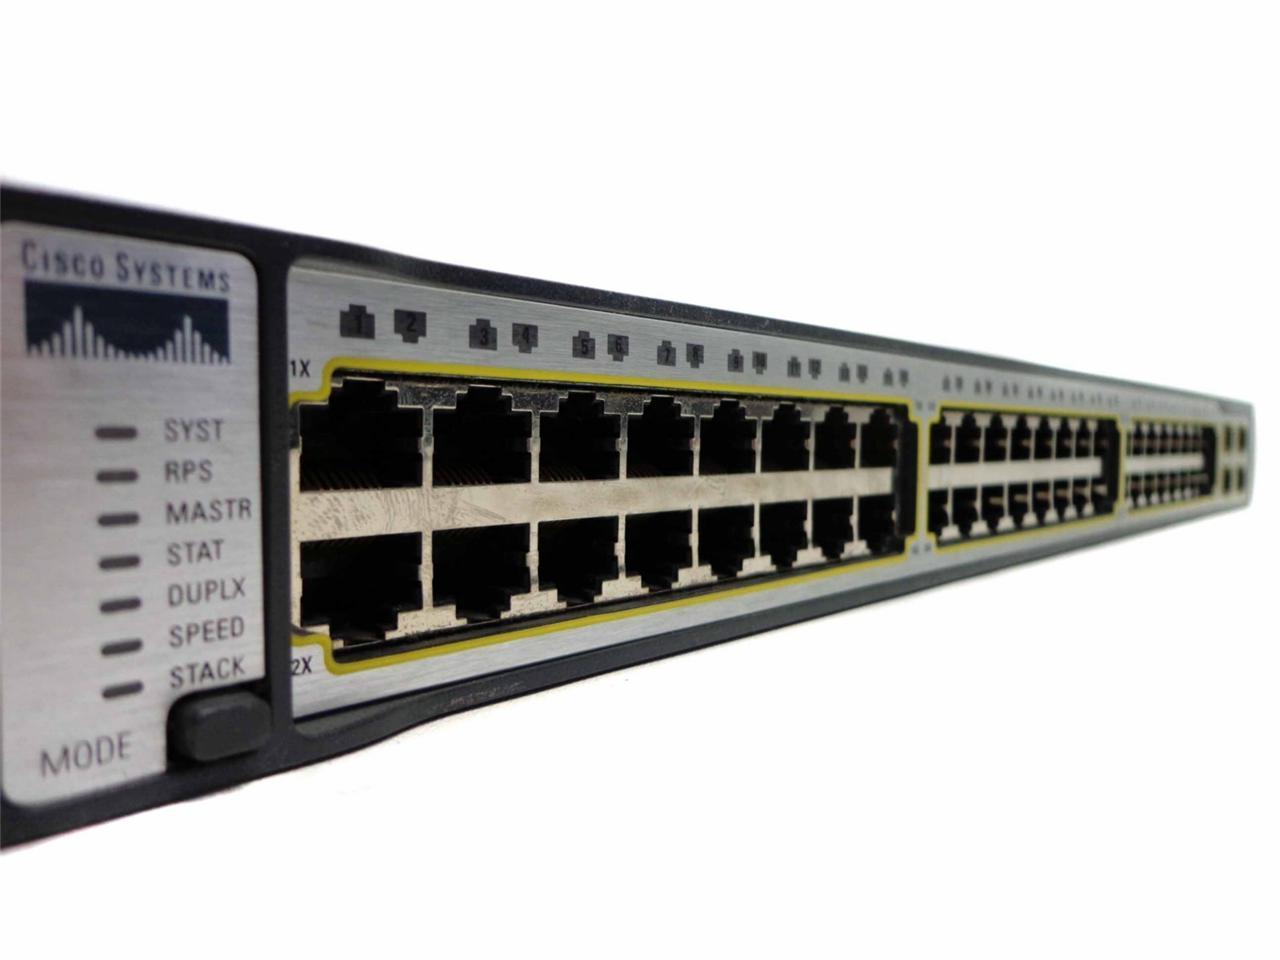 Download Working Cisco IOS for GNS3 - Srijit Banerjee's Blog